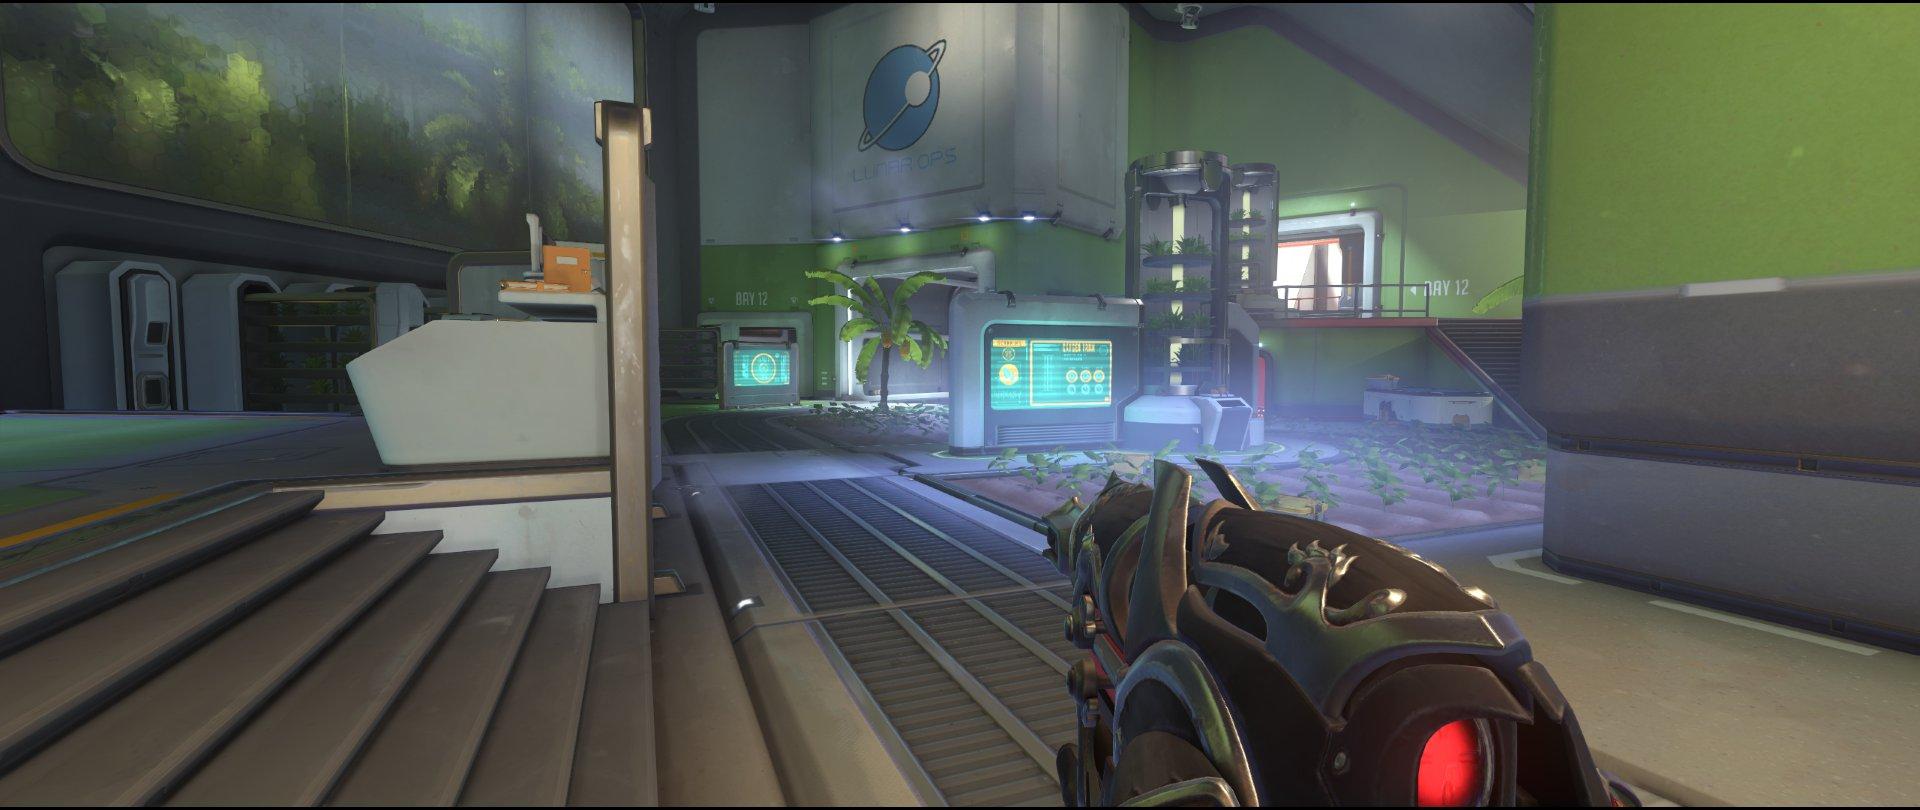 Hothouse attack sniping spot Widowmaker Horizon Lunar Colony Overwatch